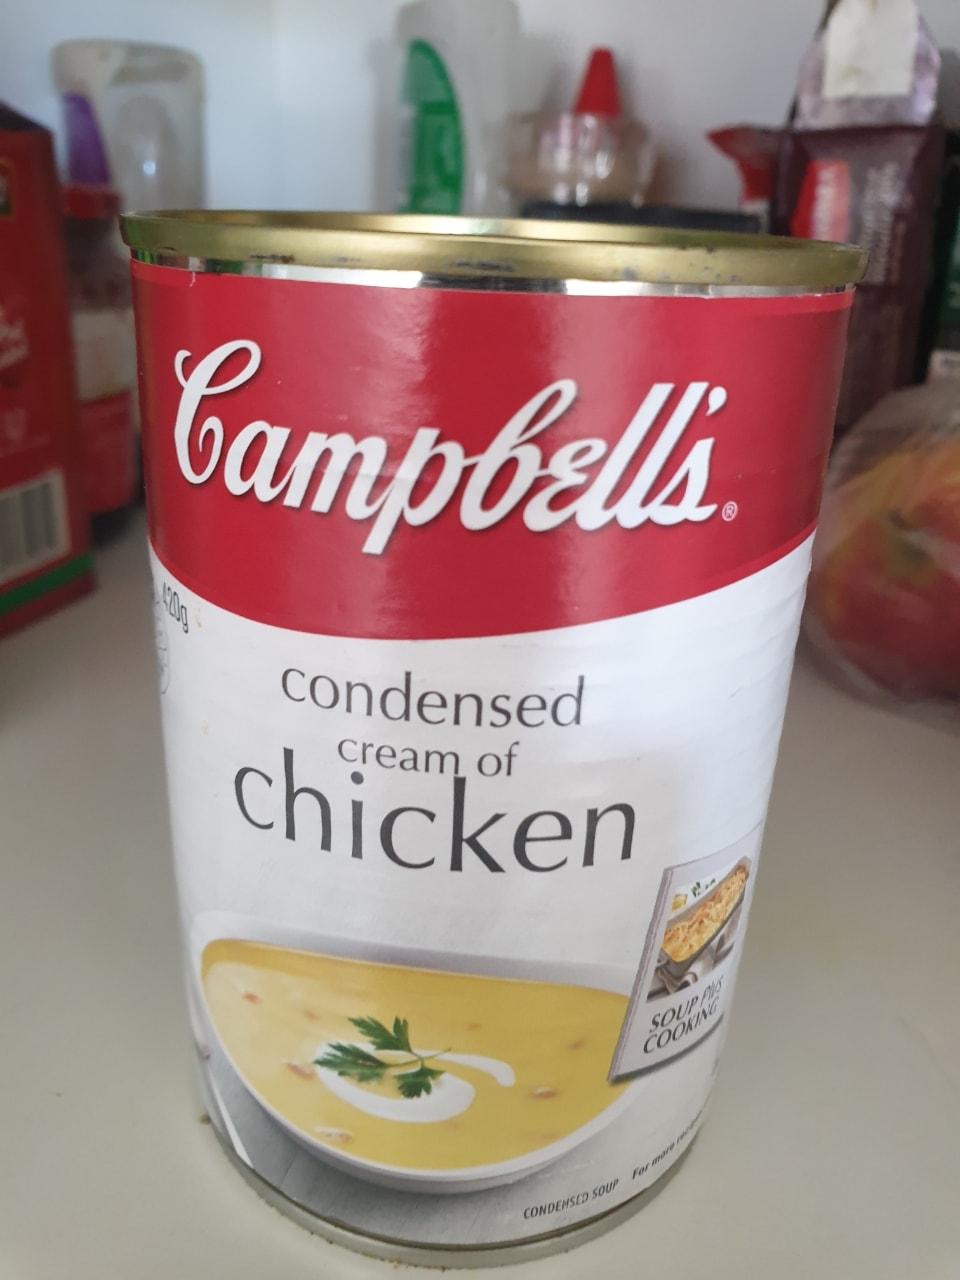 Condensed cream of chicken